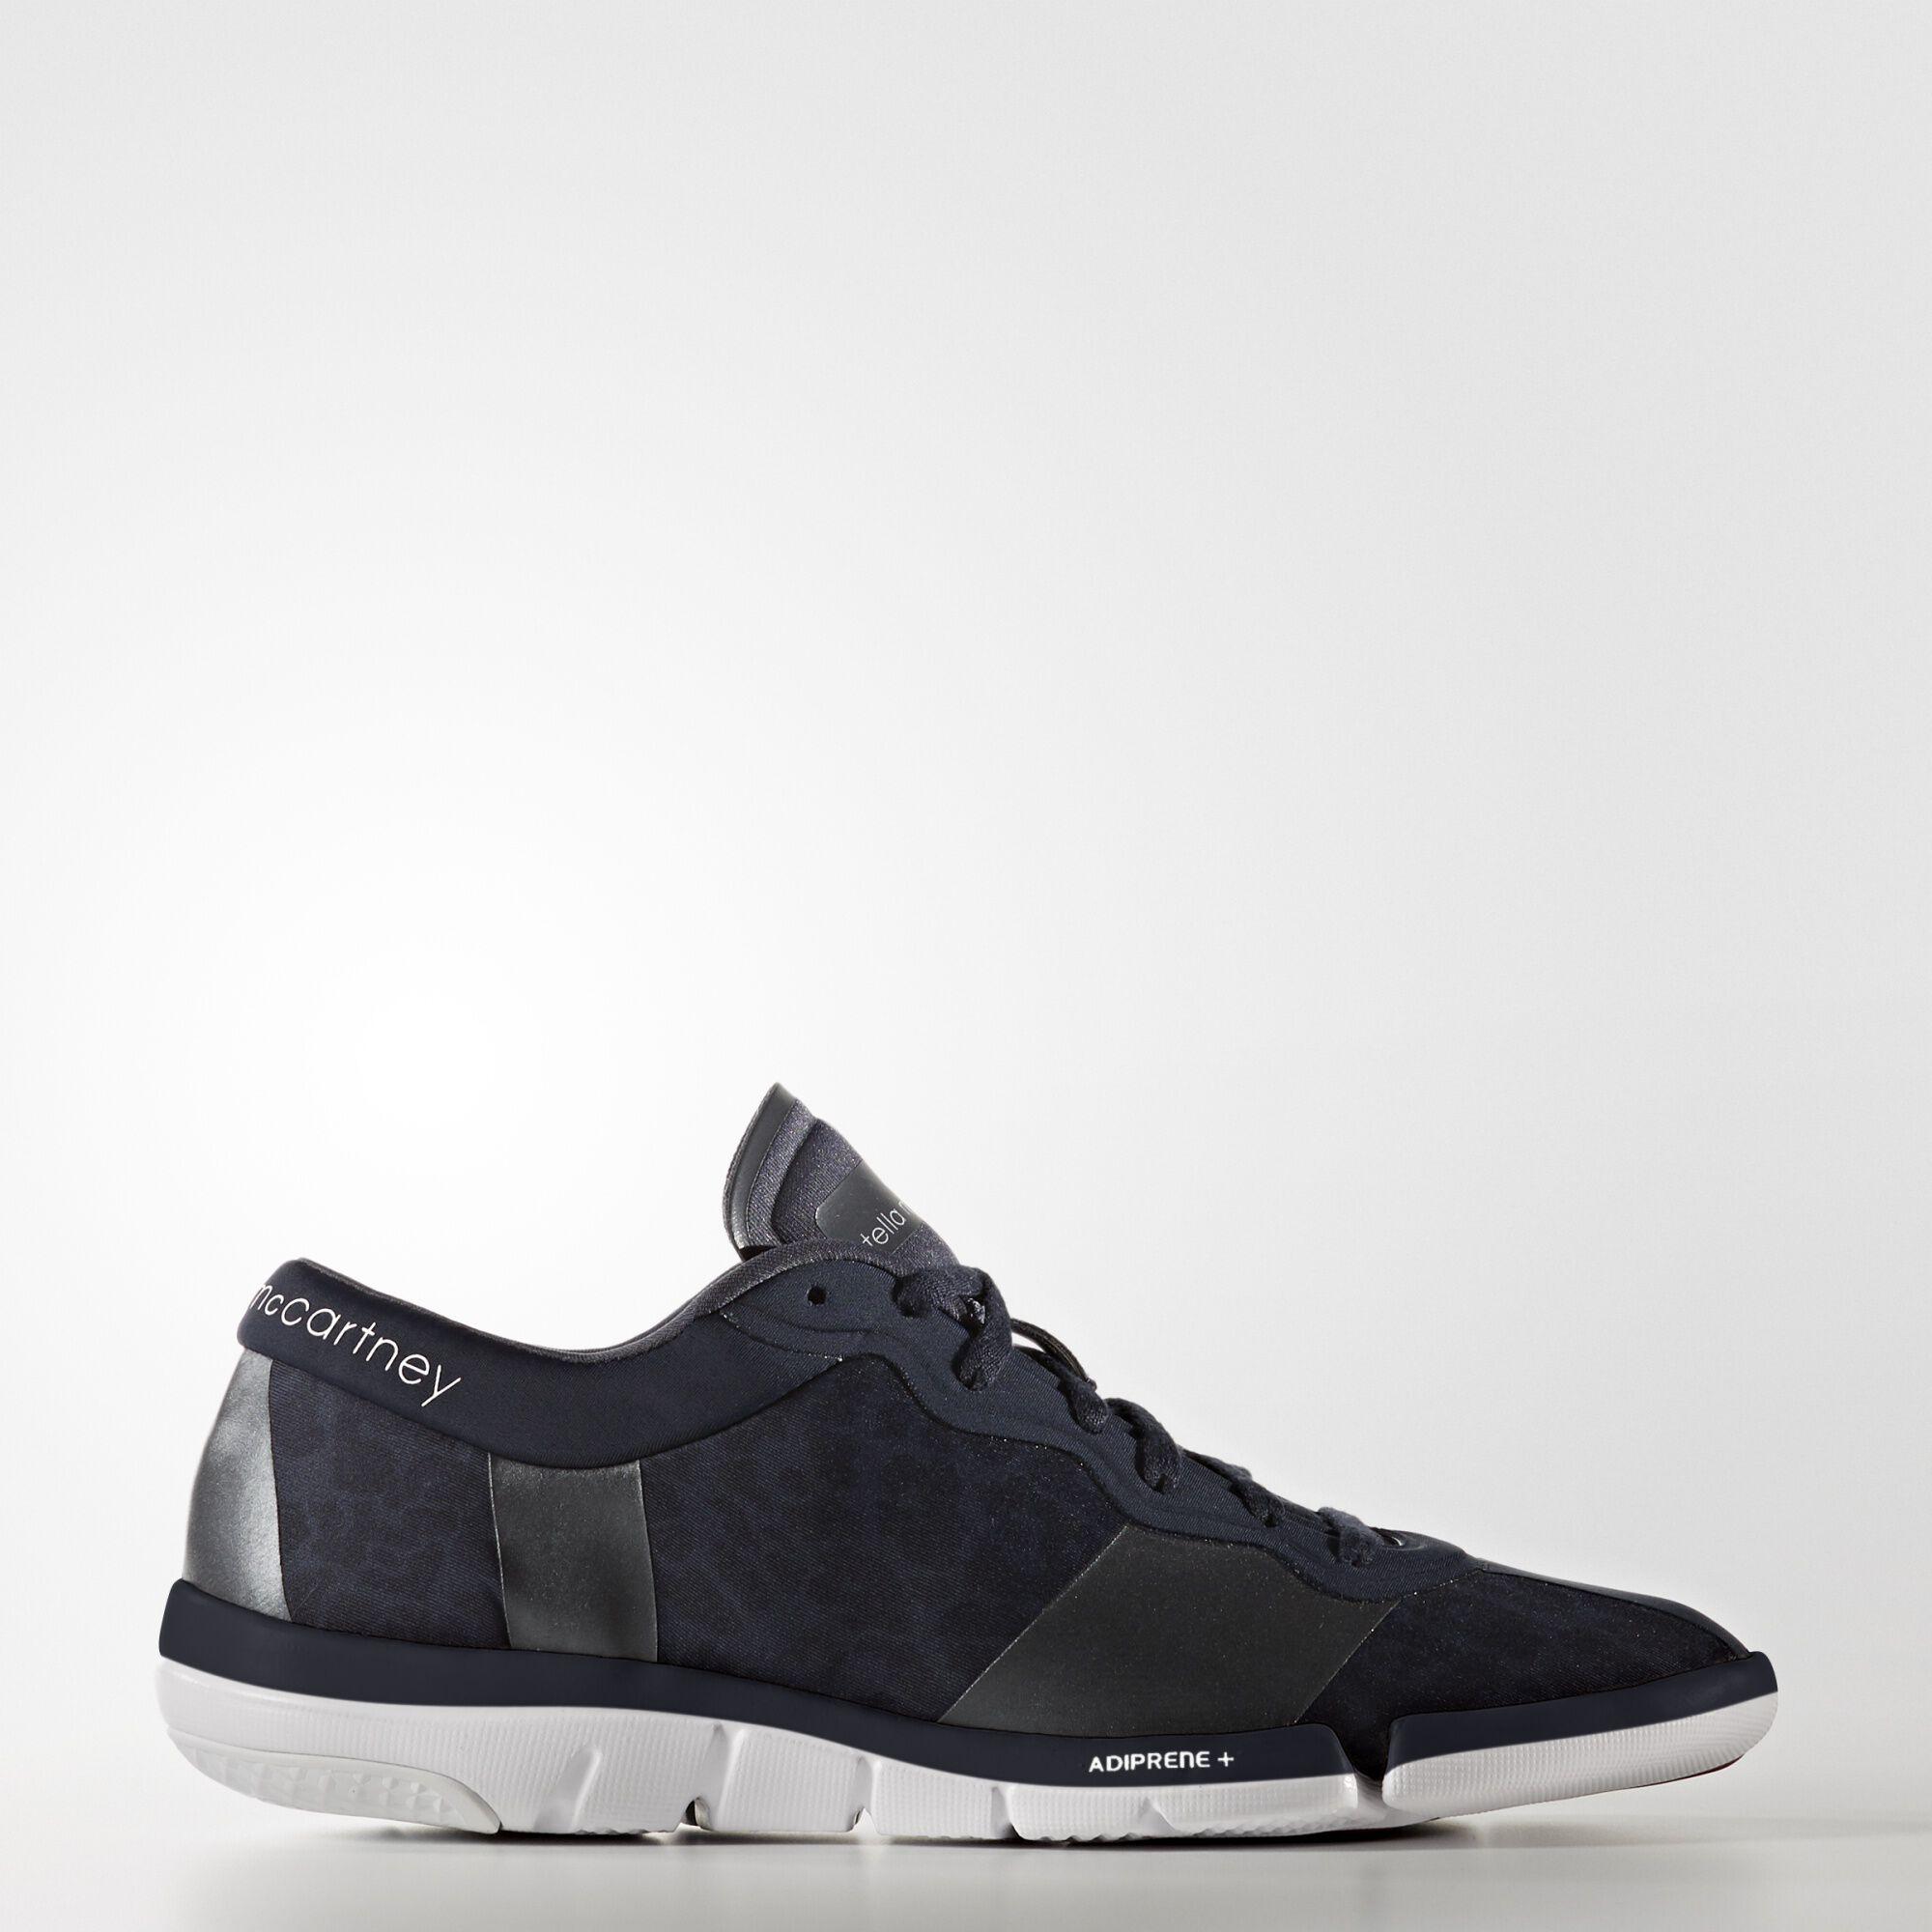 Adidas Stella Mccartney White Shoes